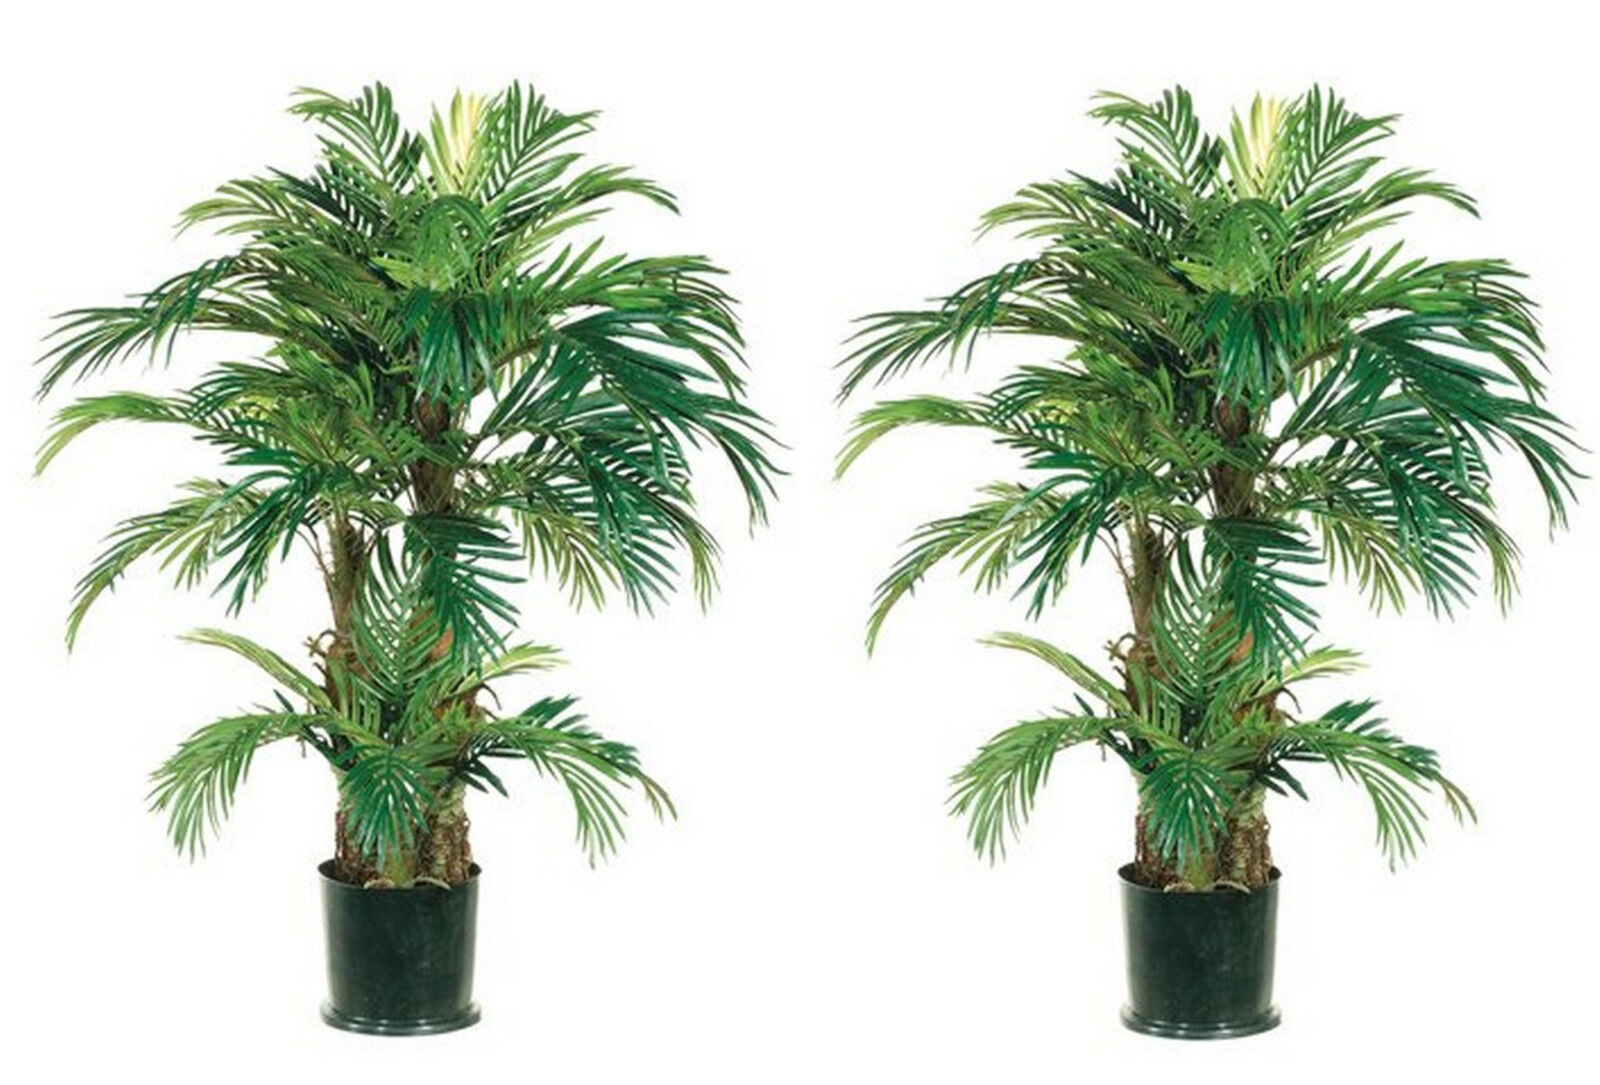 4' PHOENIX TRIPLE PALM ARTIFICIAL TREE SILK PLANT BUSH DECOR POTTED HOME DECOR 2